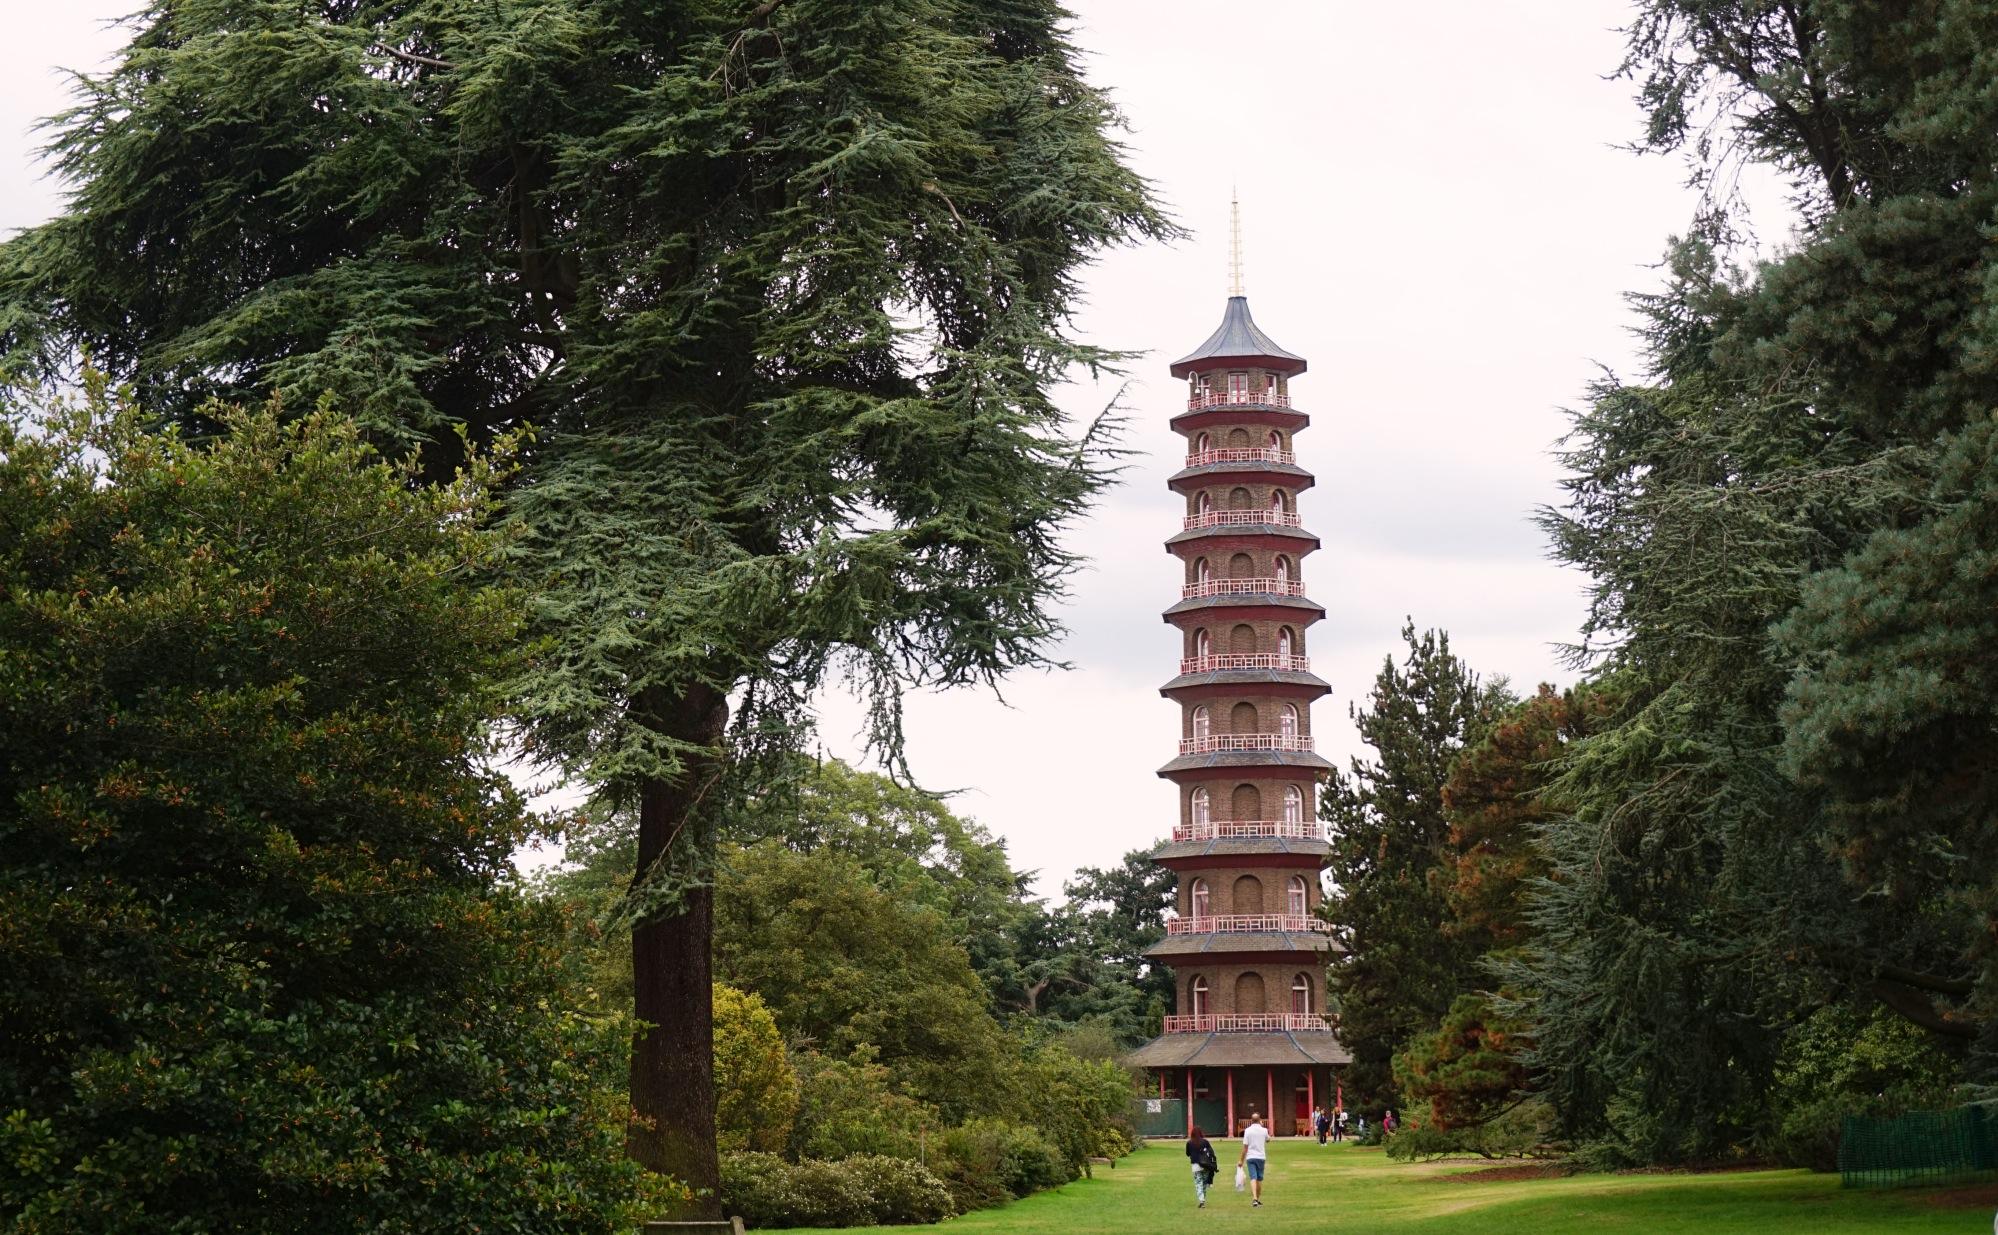 Visiter-Kew-Gardens-5